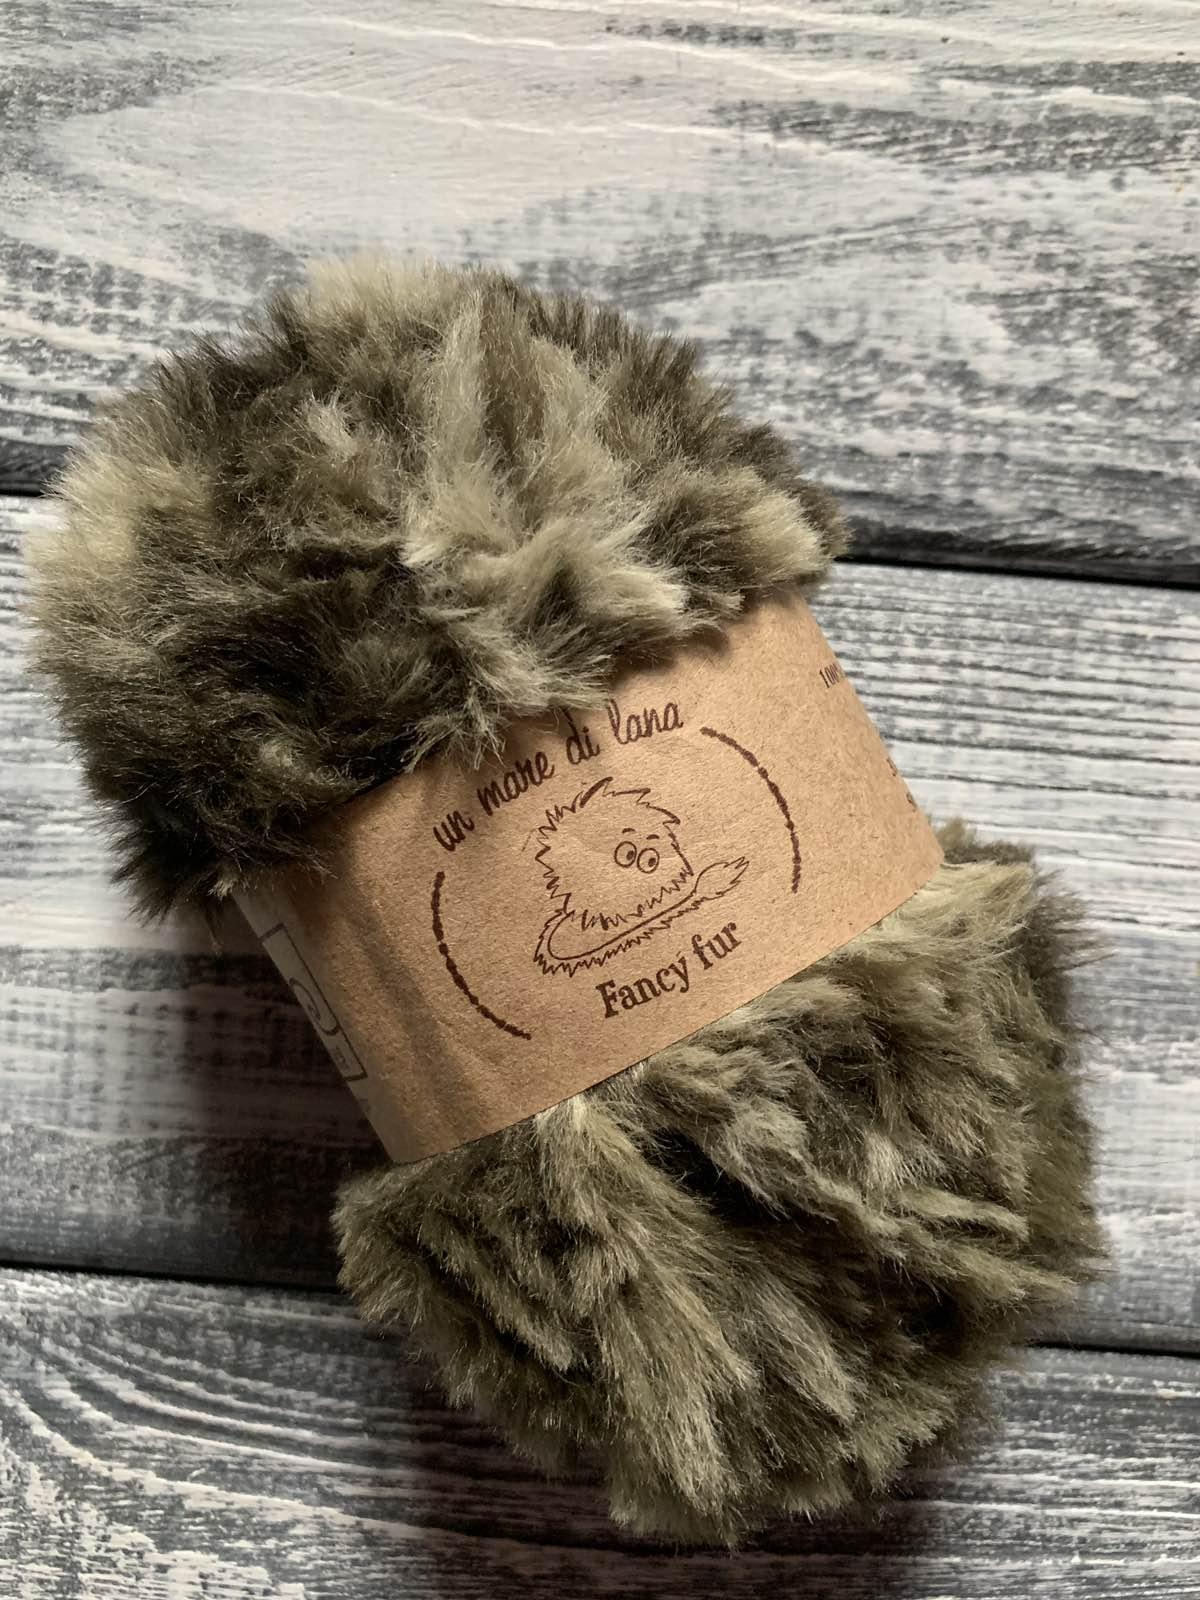 Wool Sea Fancy fur (Море шерсти Фанси фе ) 117 - киви заказать со скидкой в Беларуси